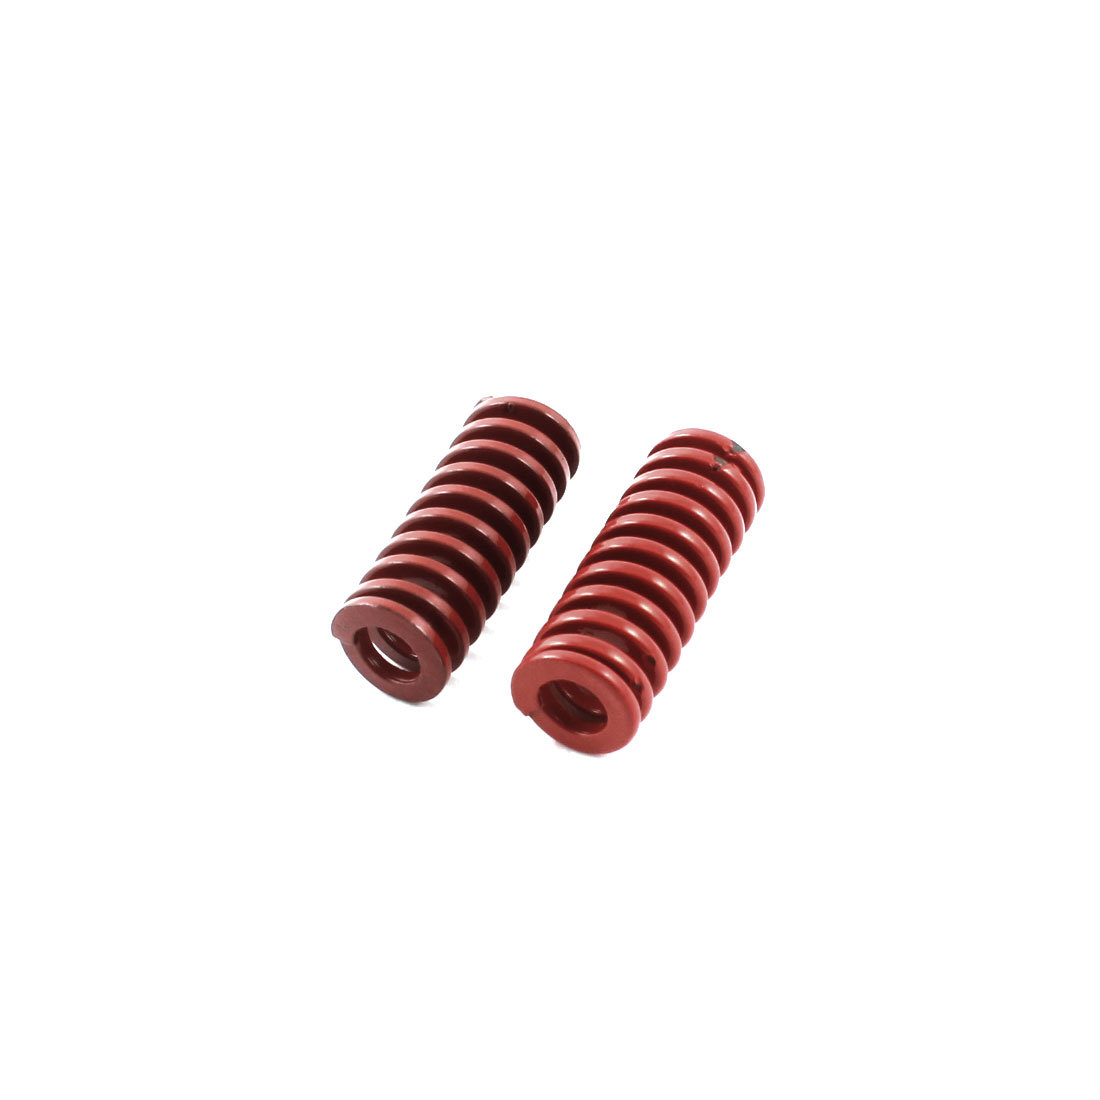 2Pcs Medium Load Red Spiral Stamping Compression Die Spring 10x25mm